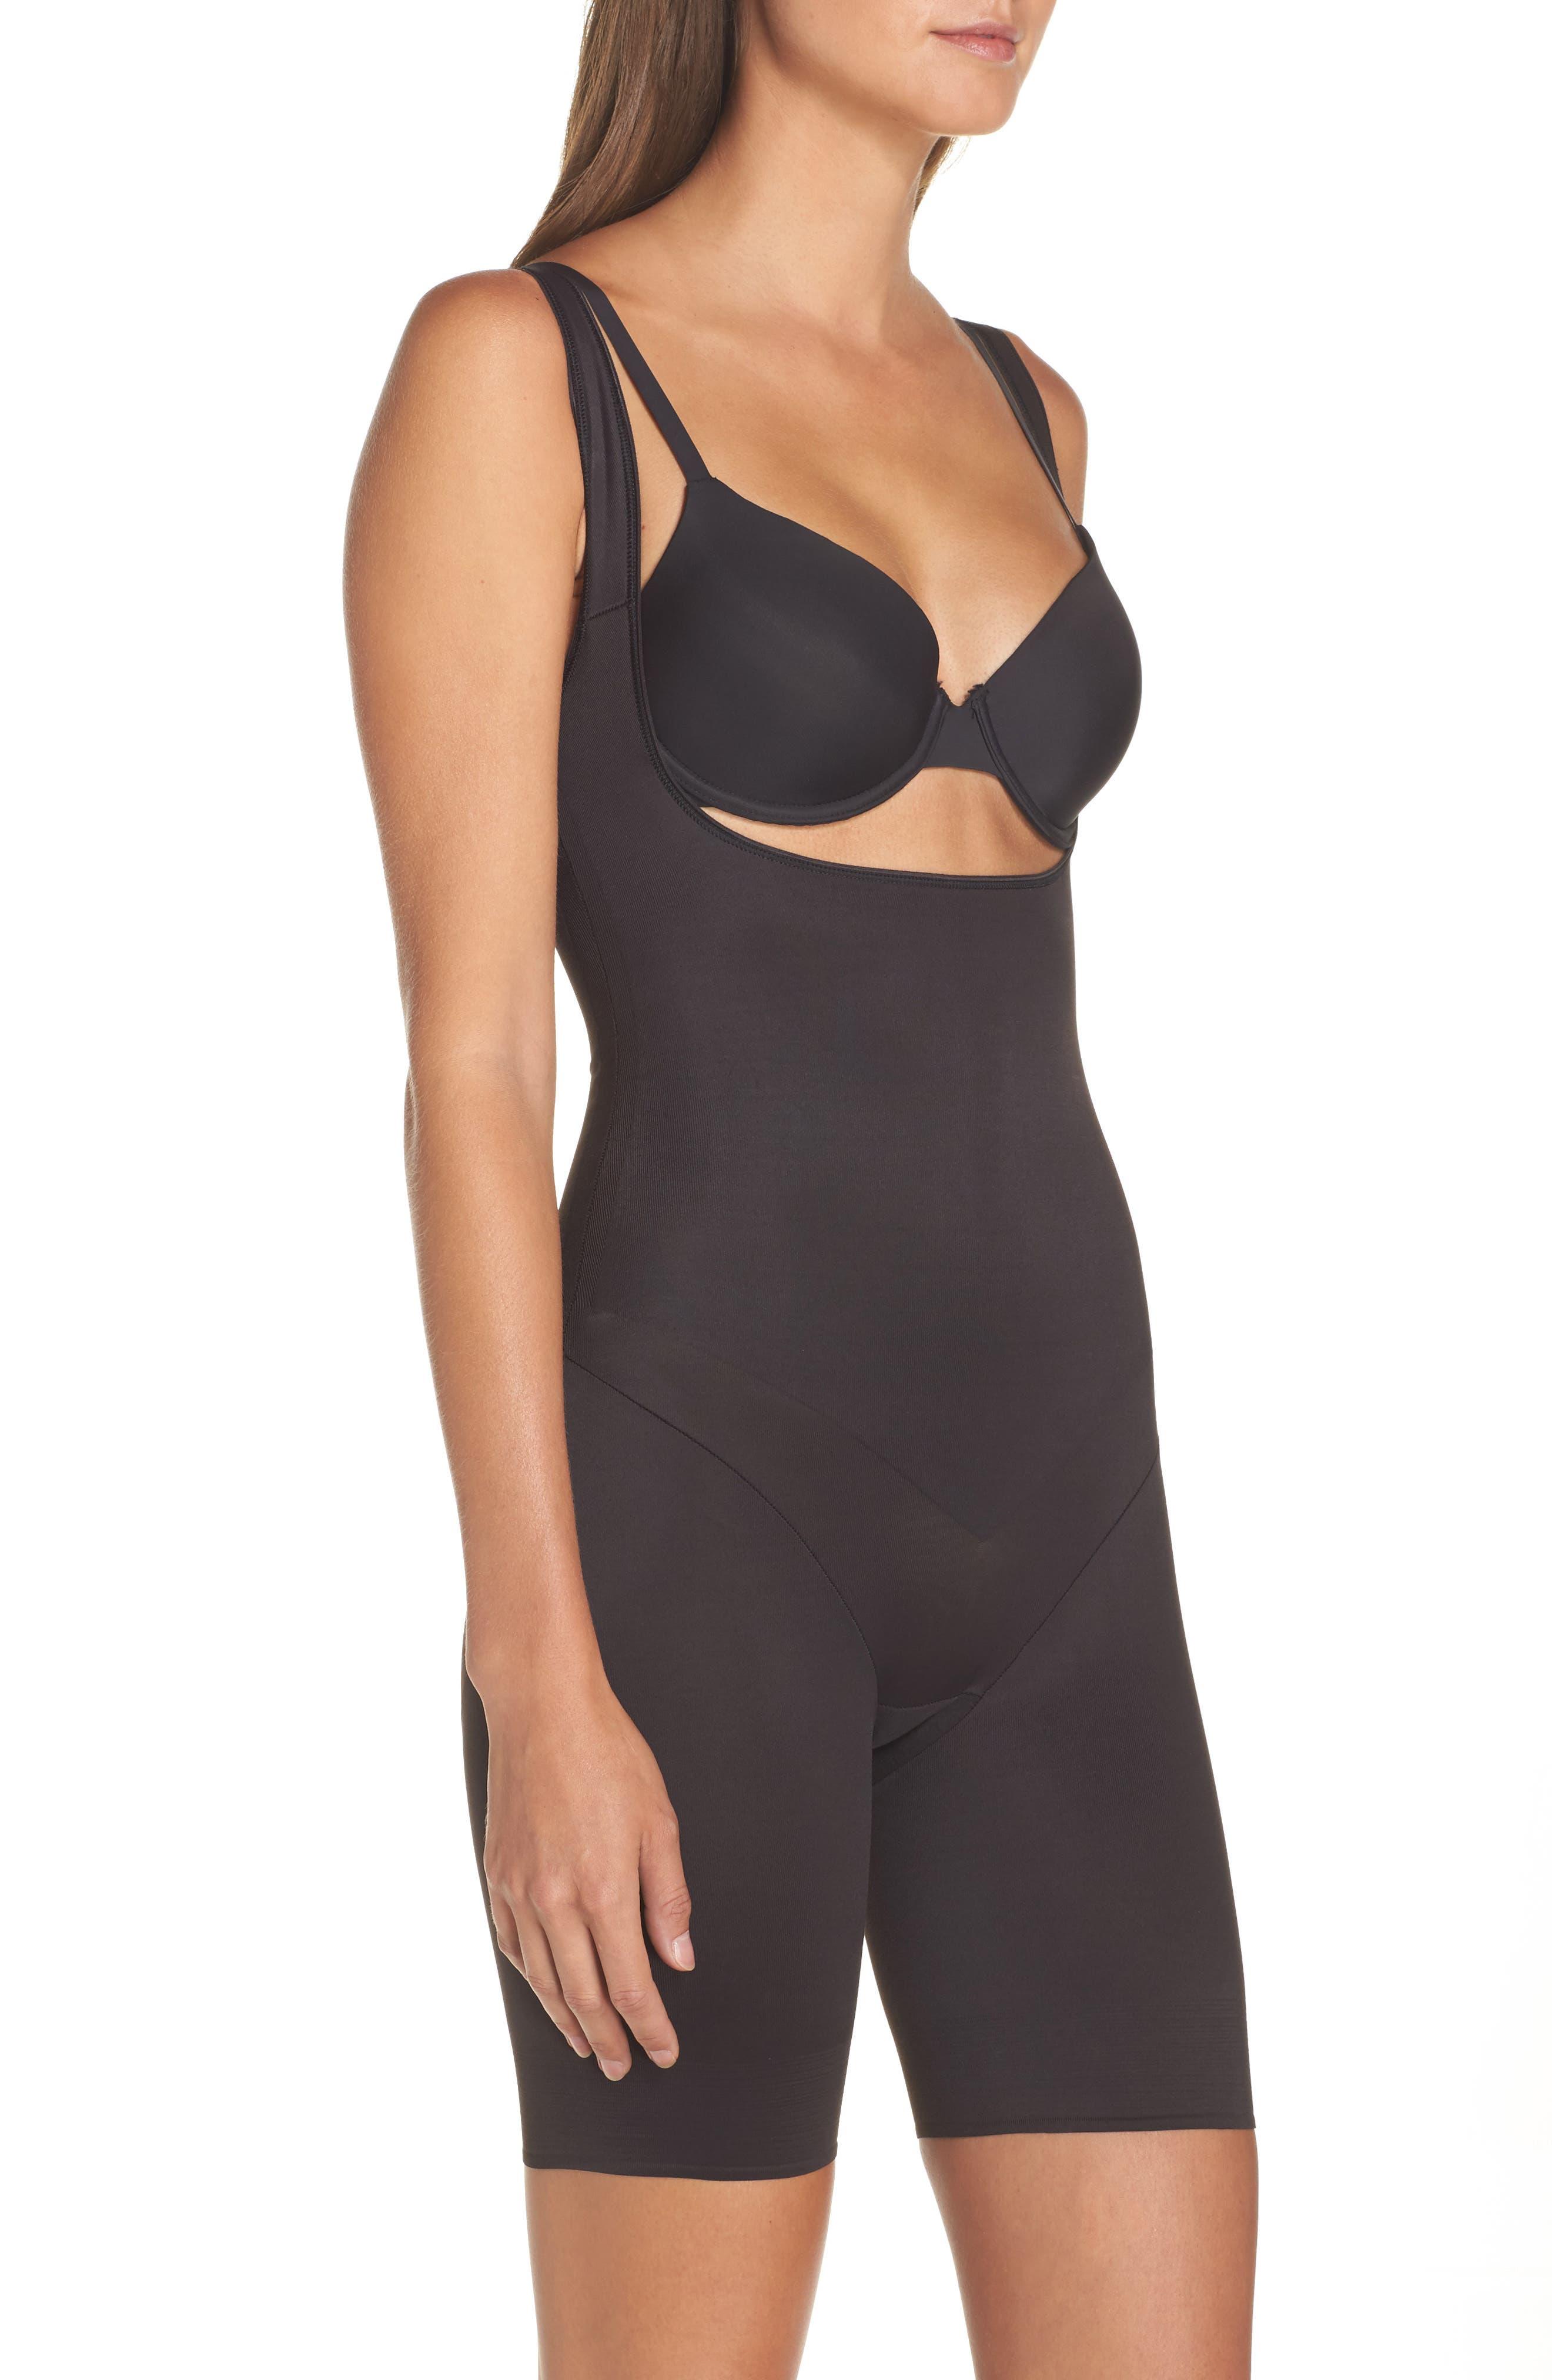 Torsette Underbust Mid Thigh Bodysuit Shaper,                             Alternate thumbnail 4, color,                             BLACK